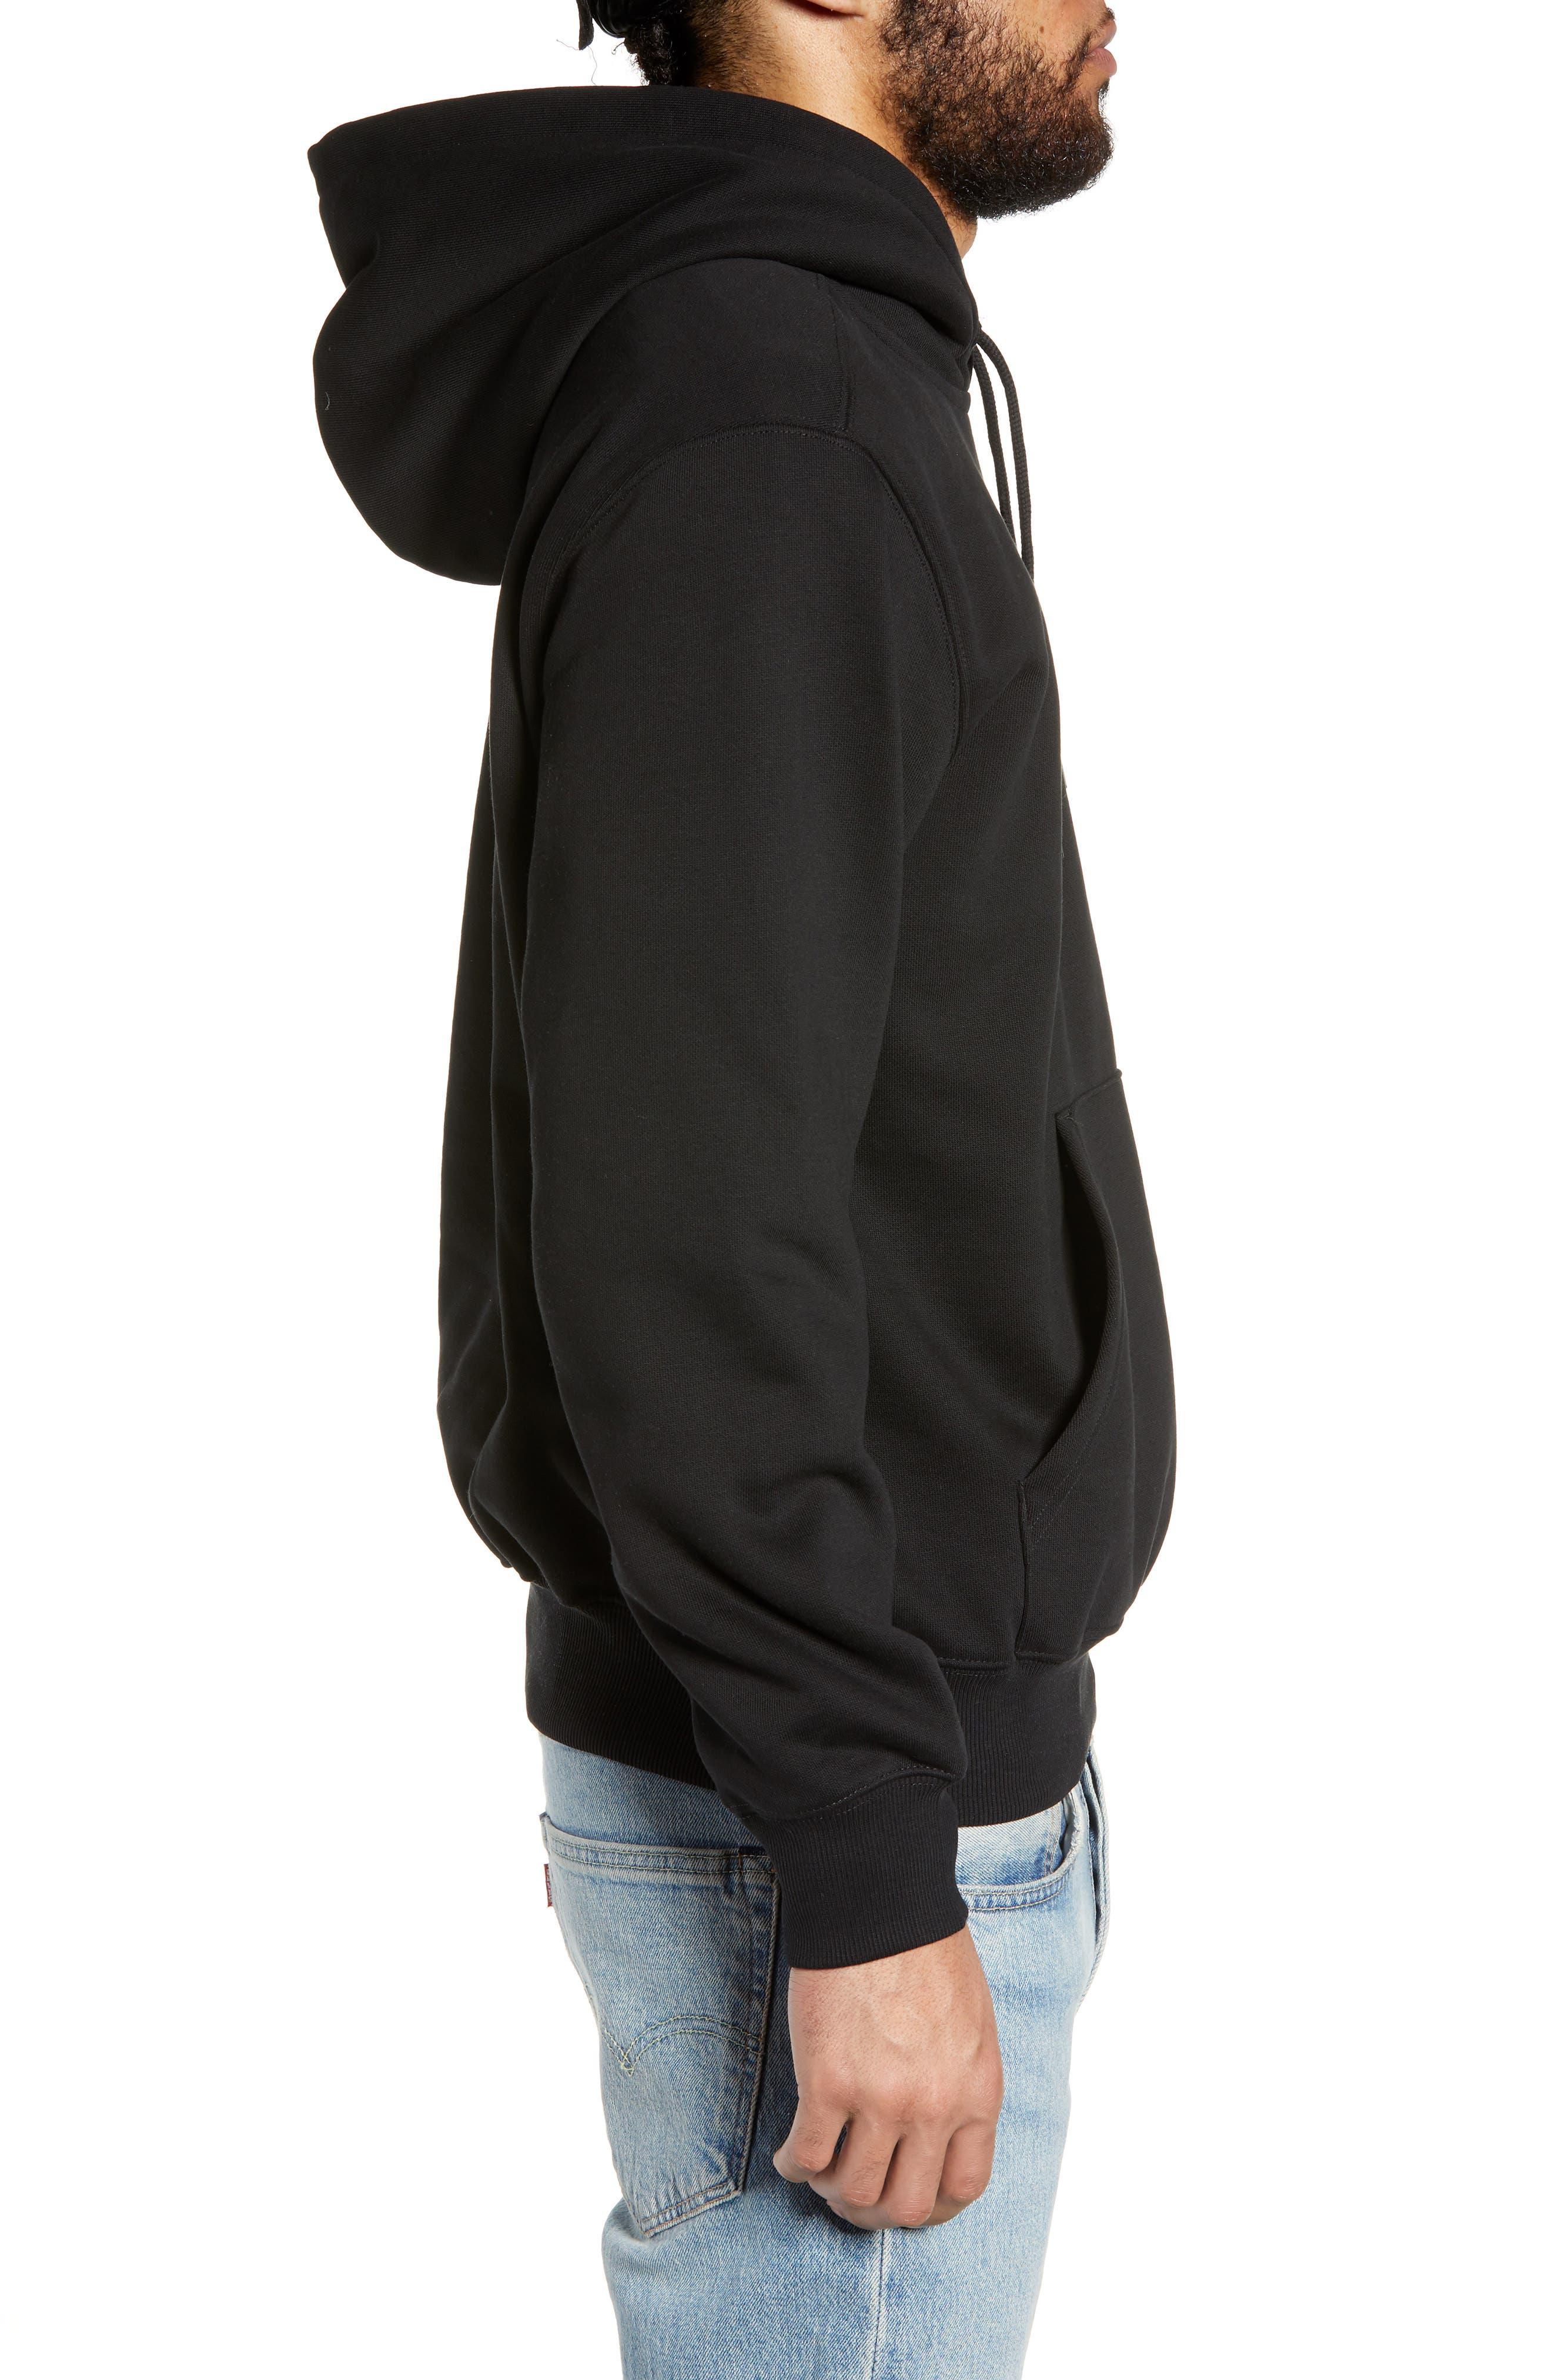 CARHARTT WORK IN PROGRESS, Logo Embroidered Hooded Sweatshirt, Alternate thumbnail 3, color, BLACK / WHITE